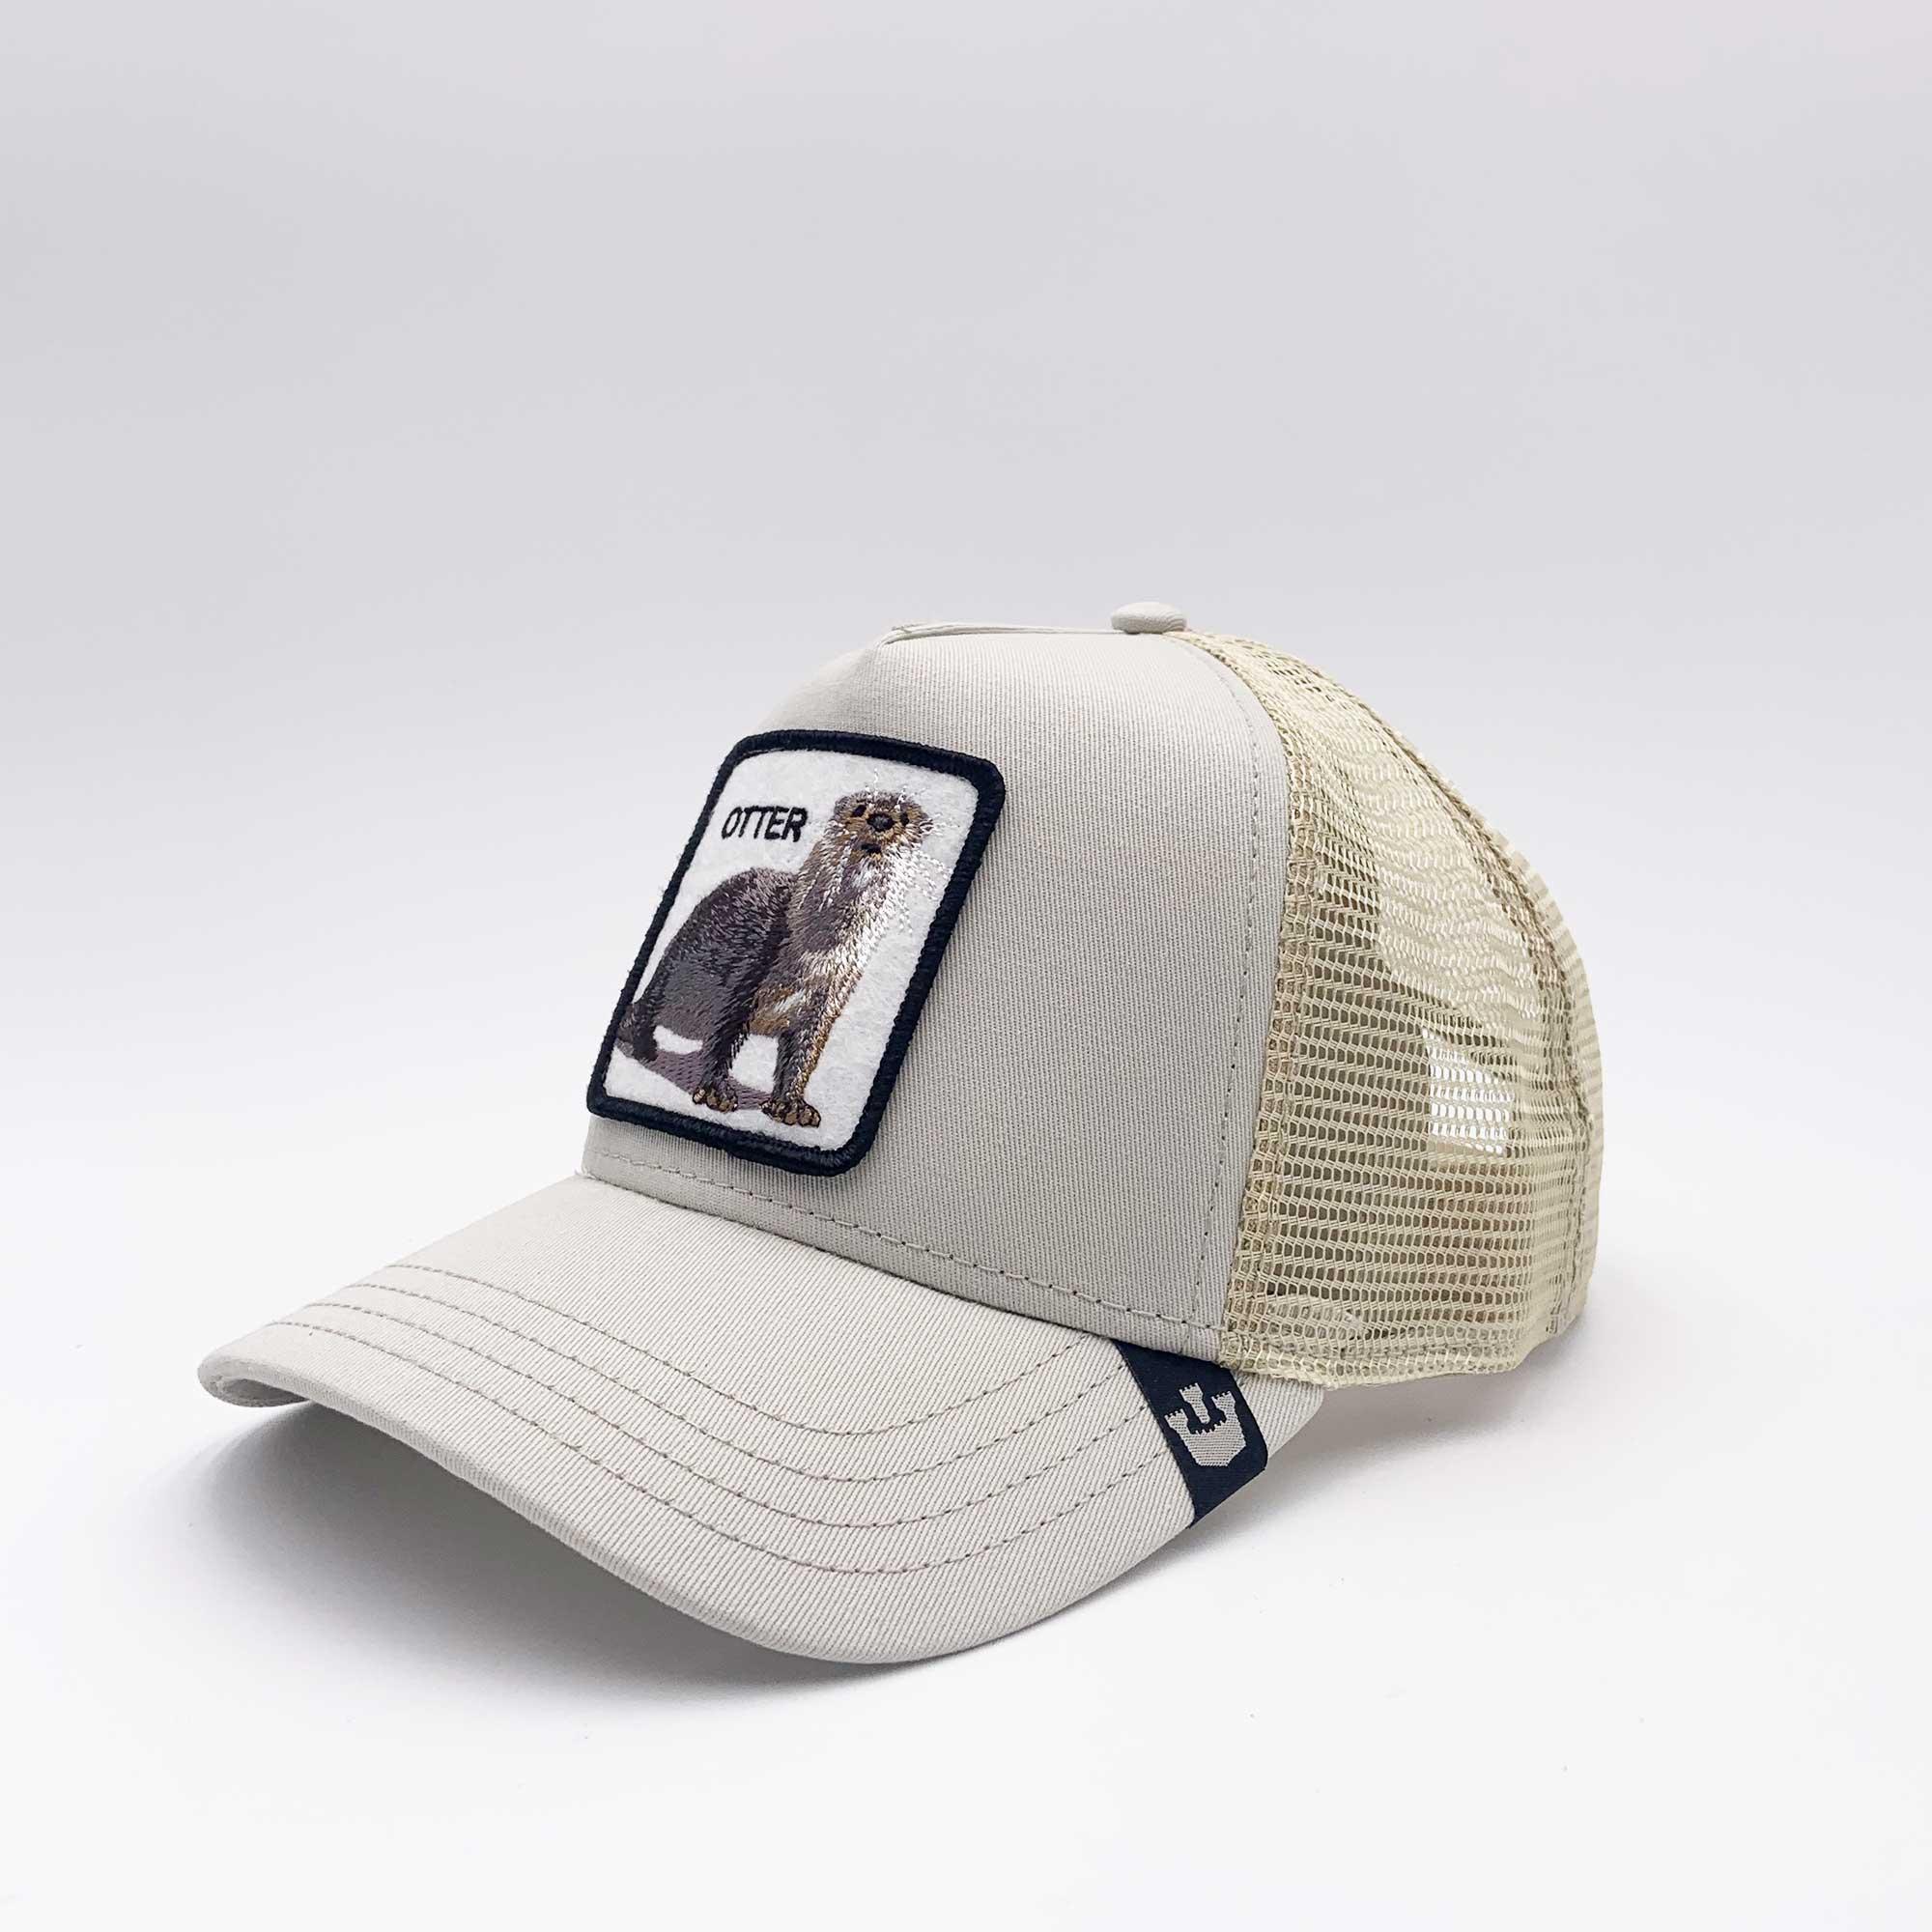 Cappello baseball otter - Bianco